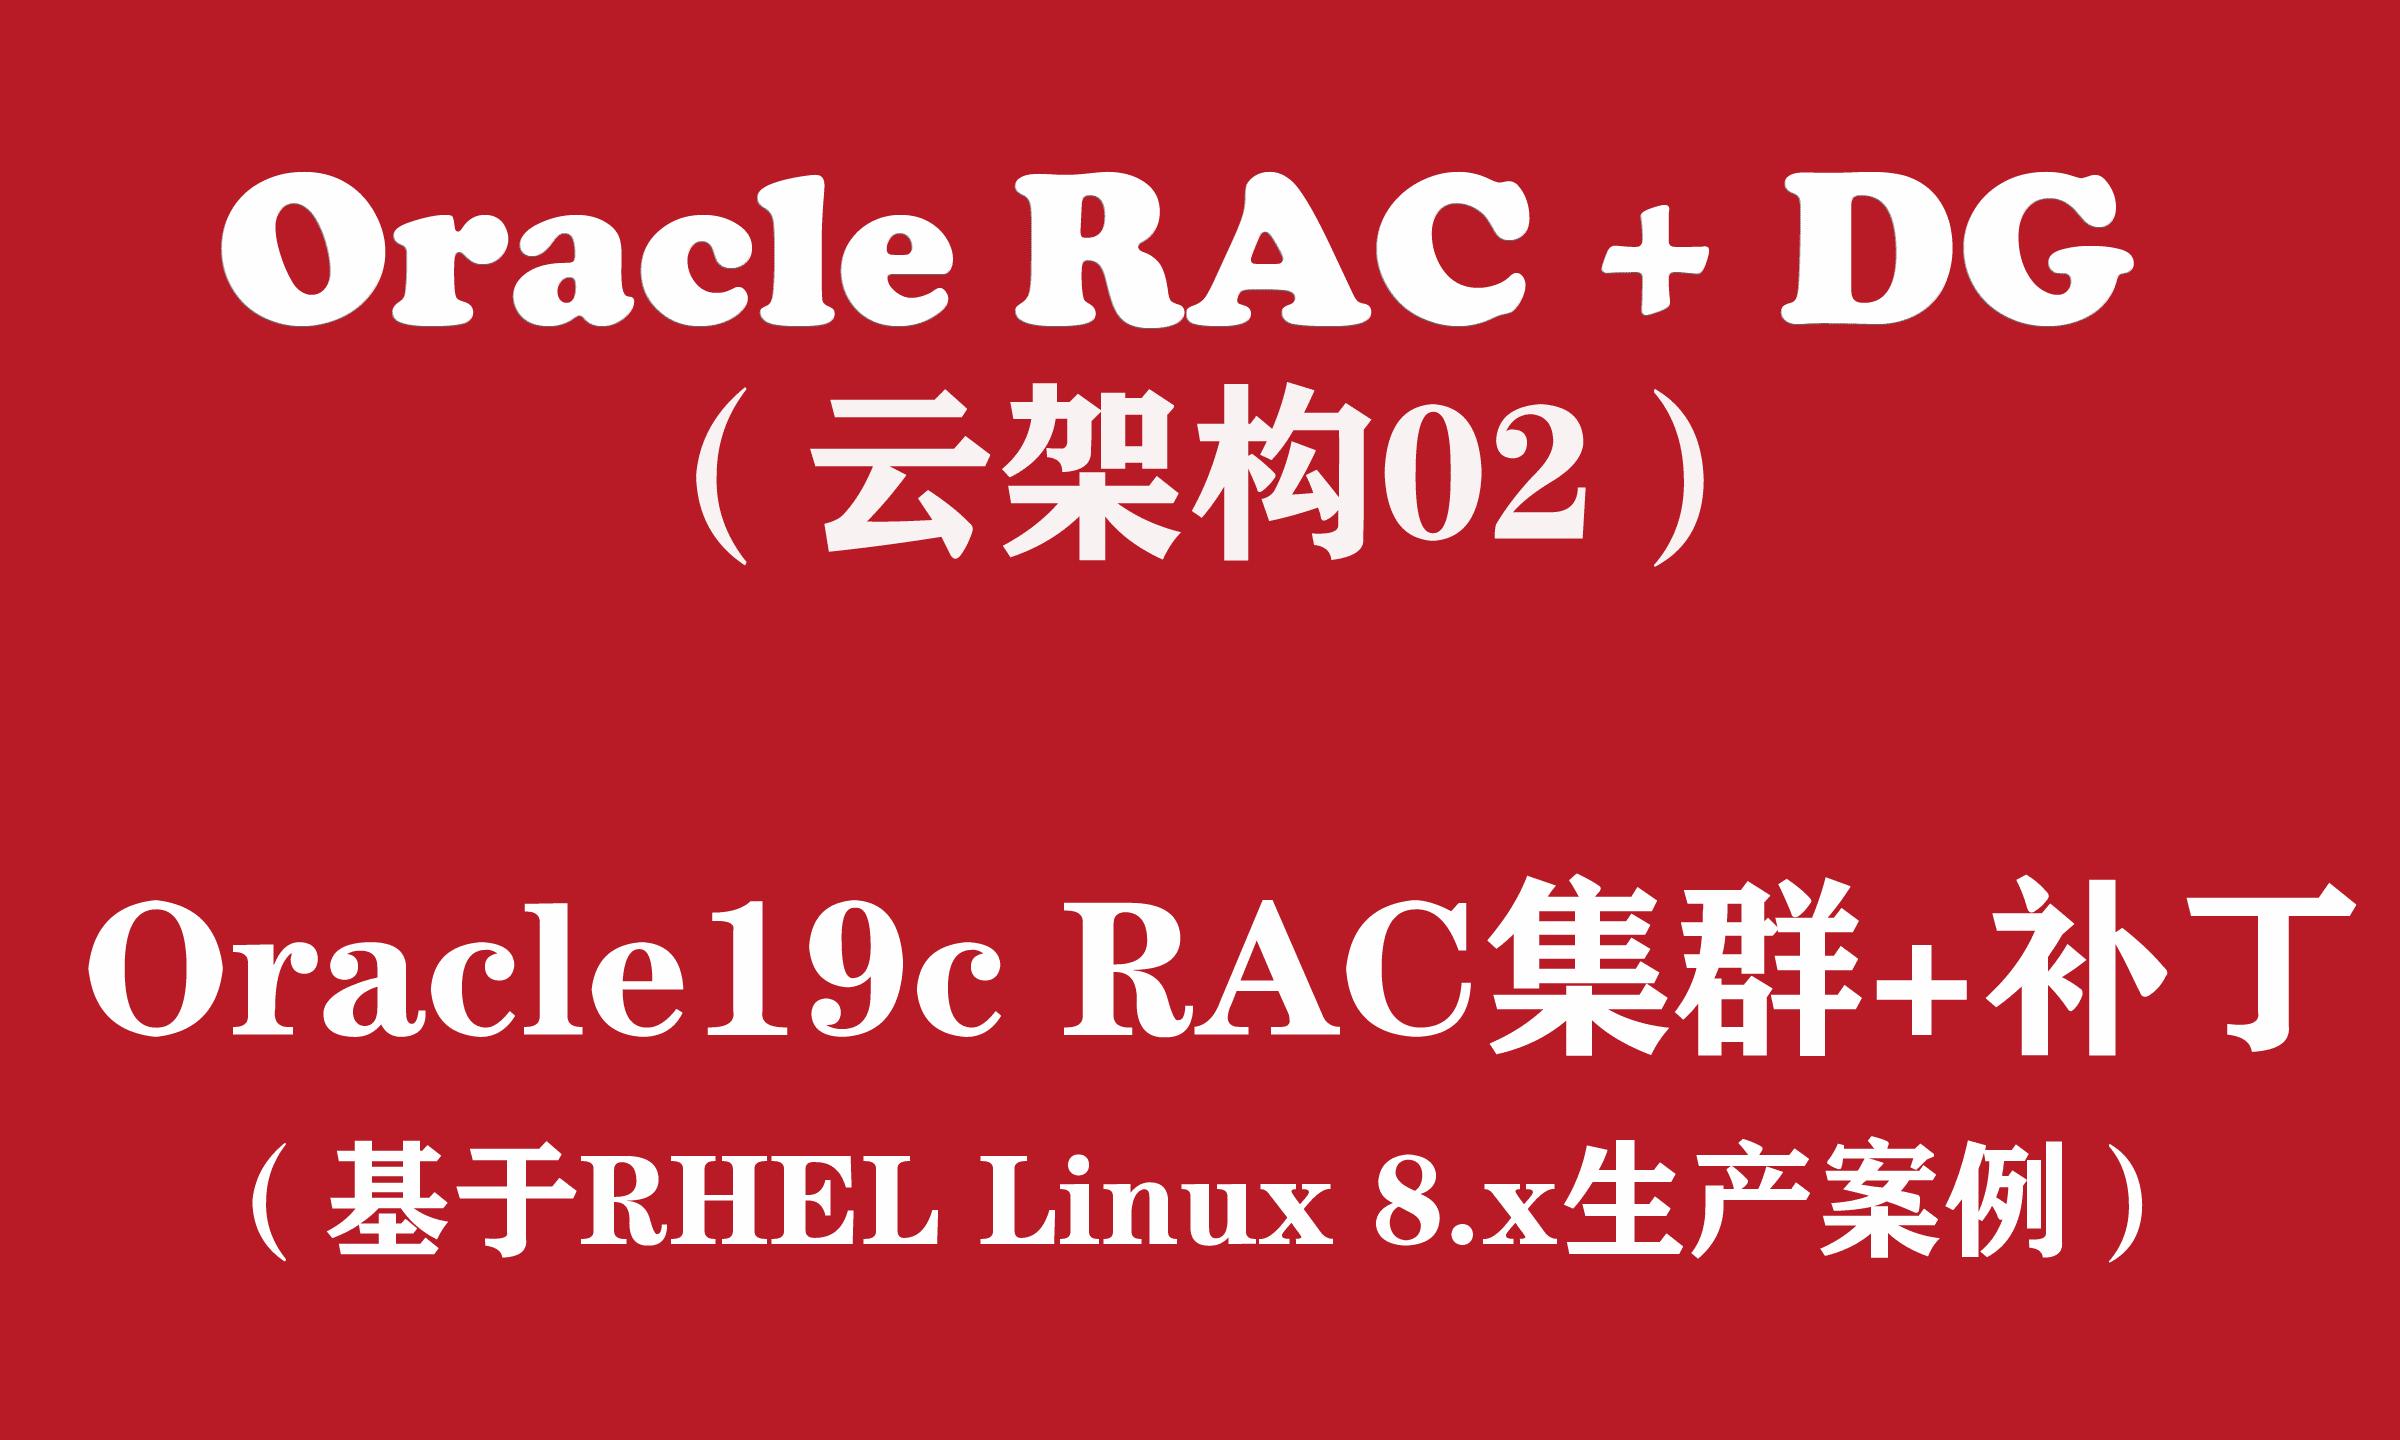 Oracle RAC+DG生产实战(2):Oracle19c RAC for Linux8安装+补丁